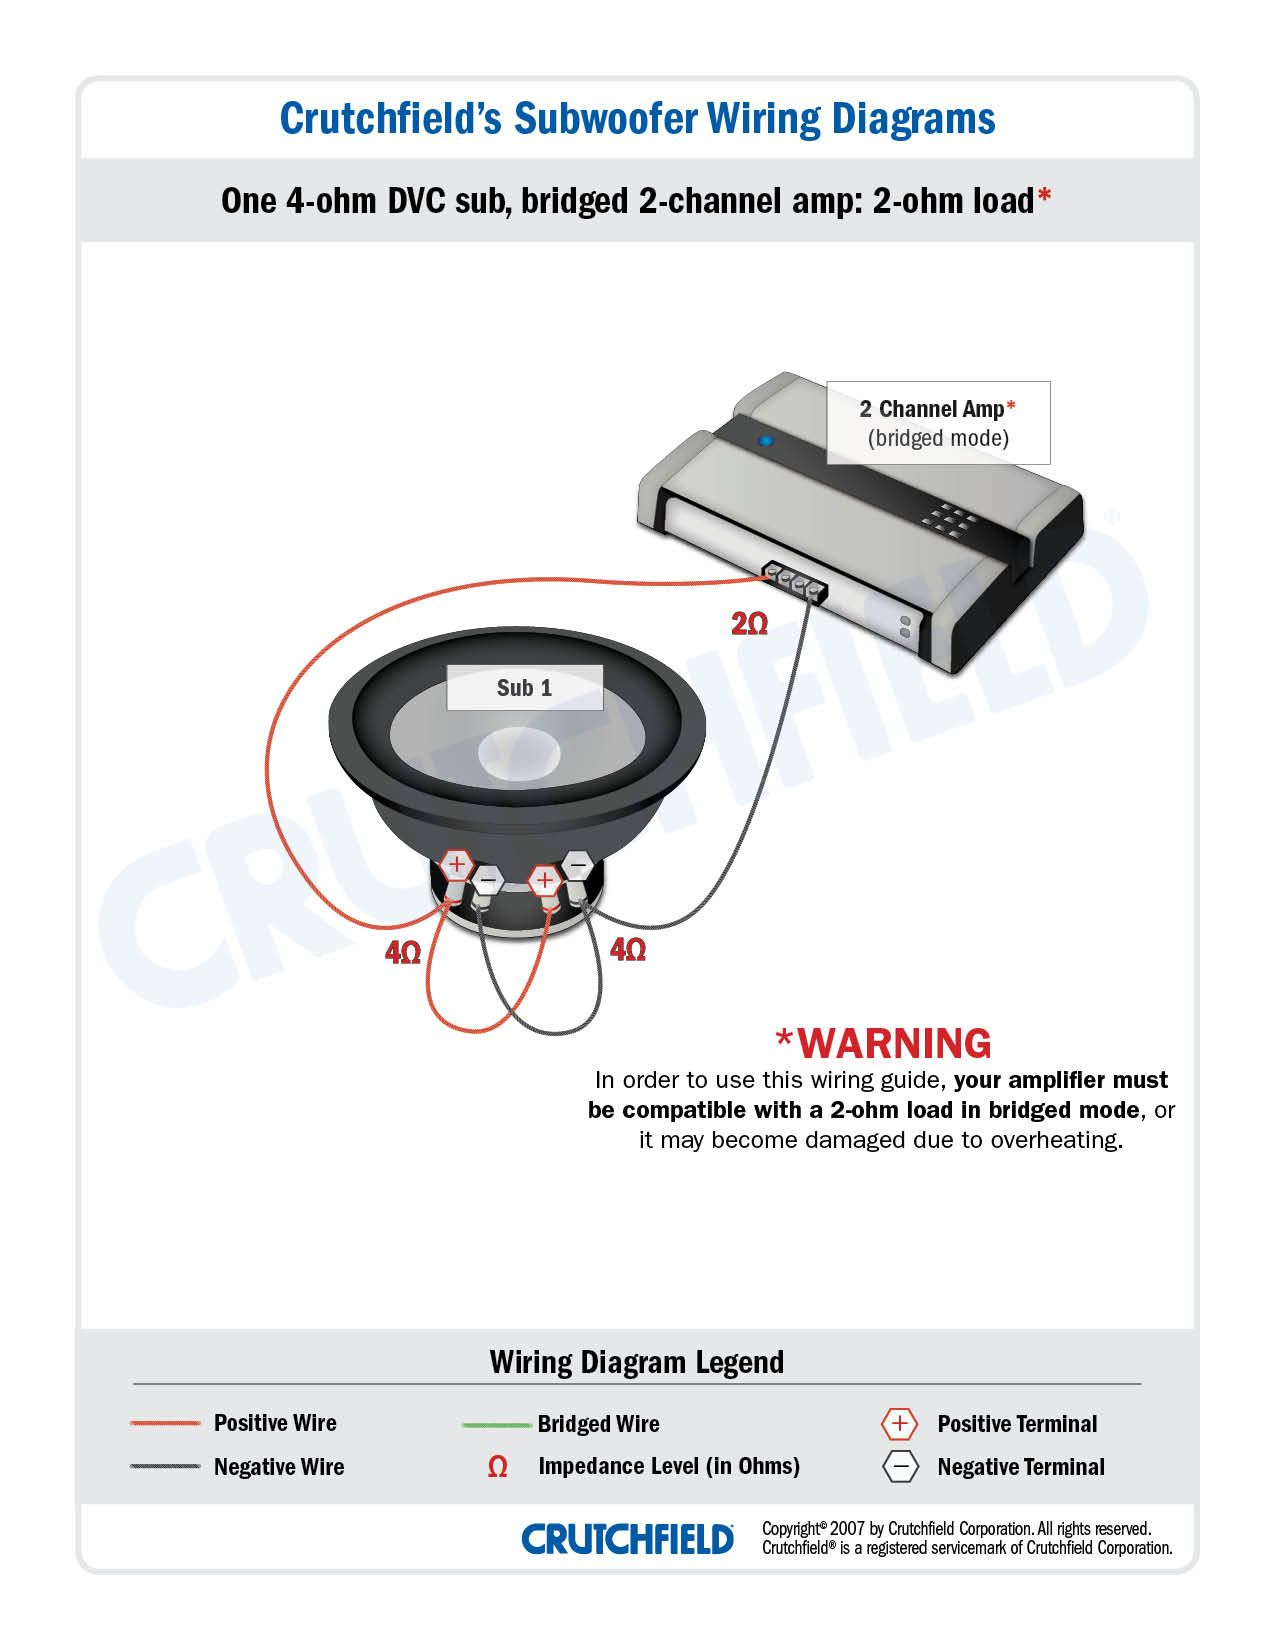 1 Dvc 4 Ohm 2 Ch Low Imp Jpg 1275 1650 Subwoofer Wiring Car Audio Installation Car Audio